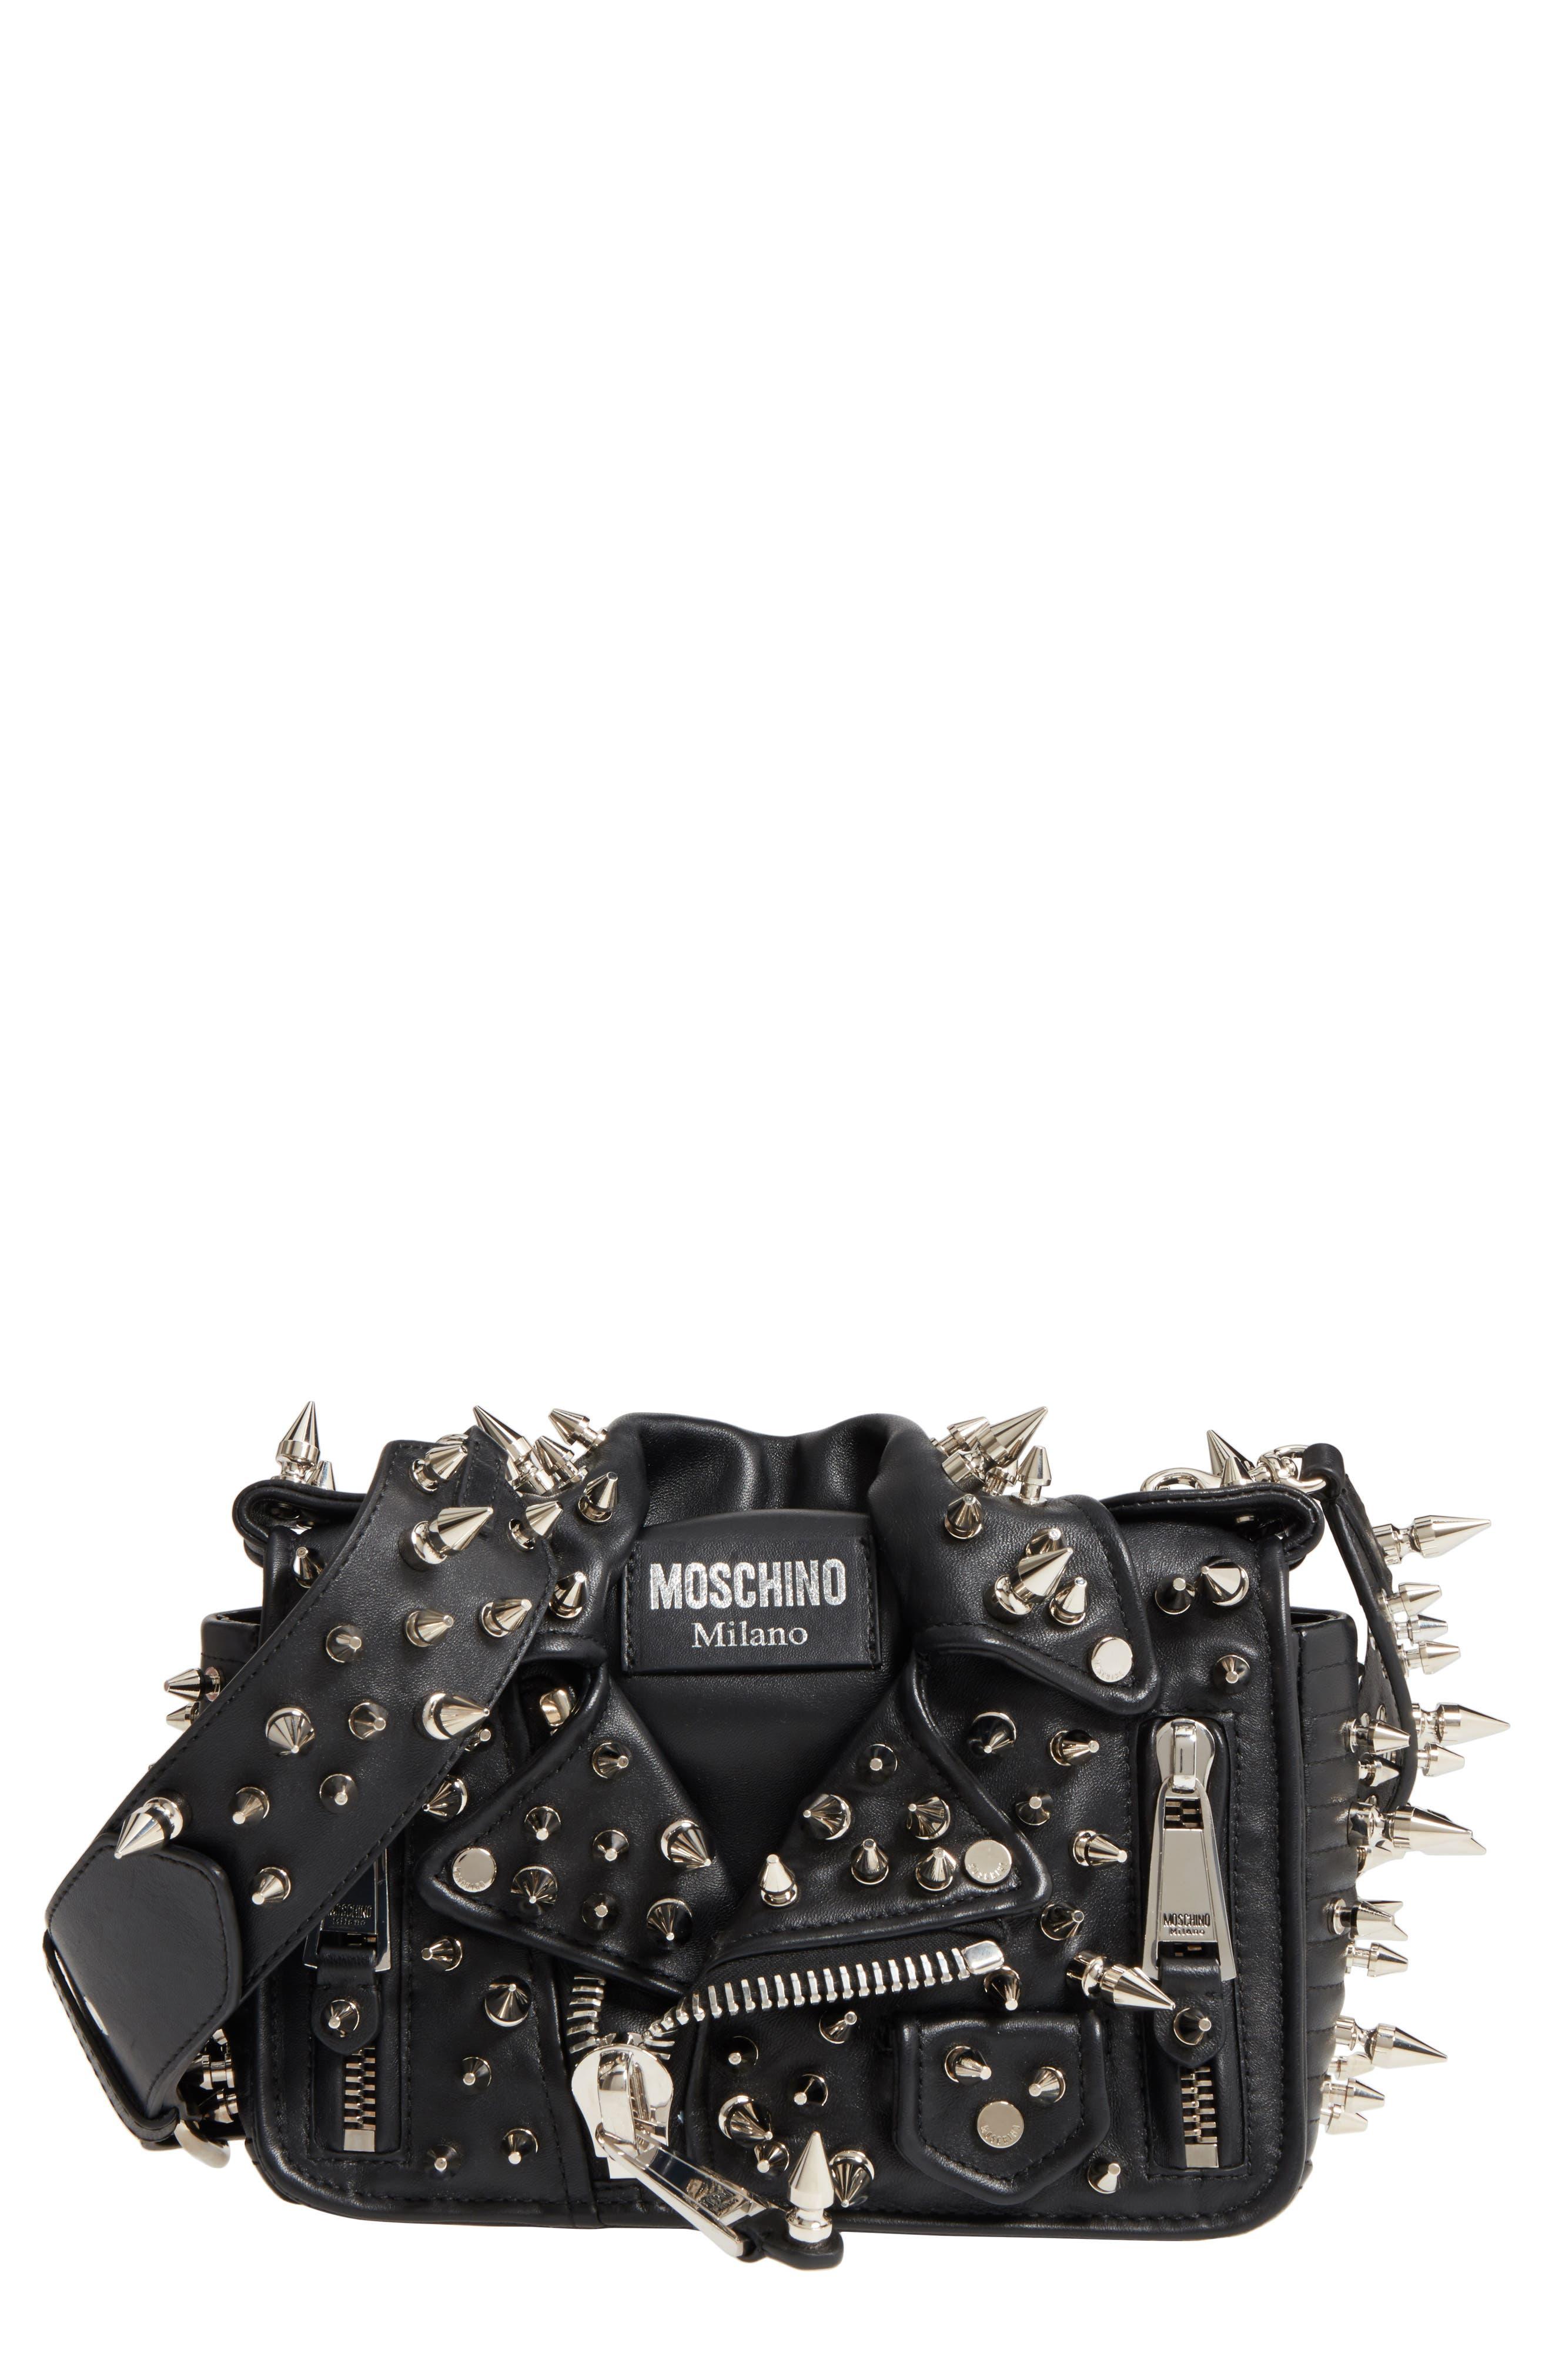 Moschino Spiked Biker Jacket Crossbody Bag